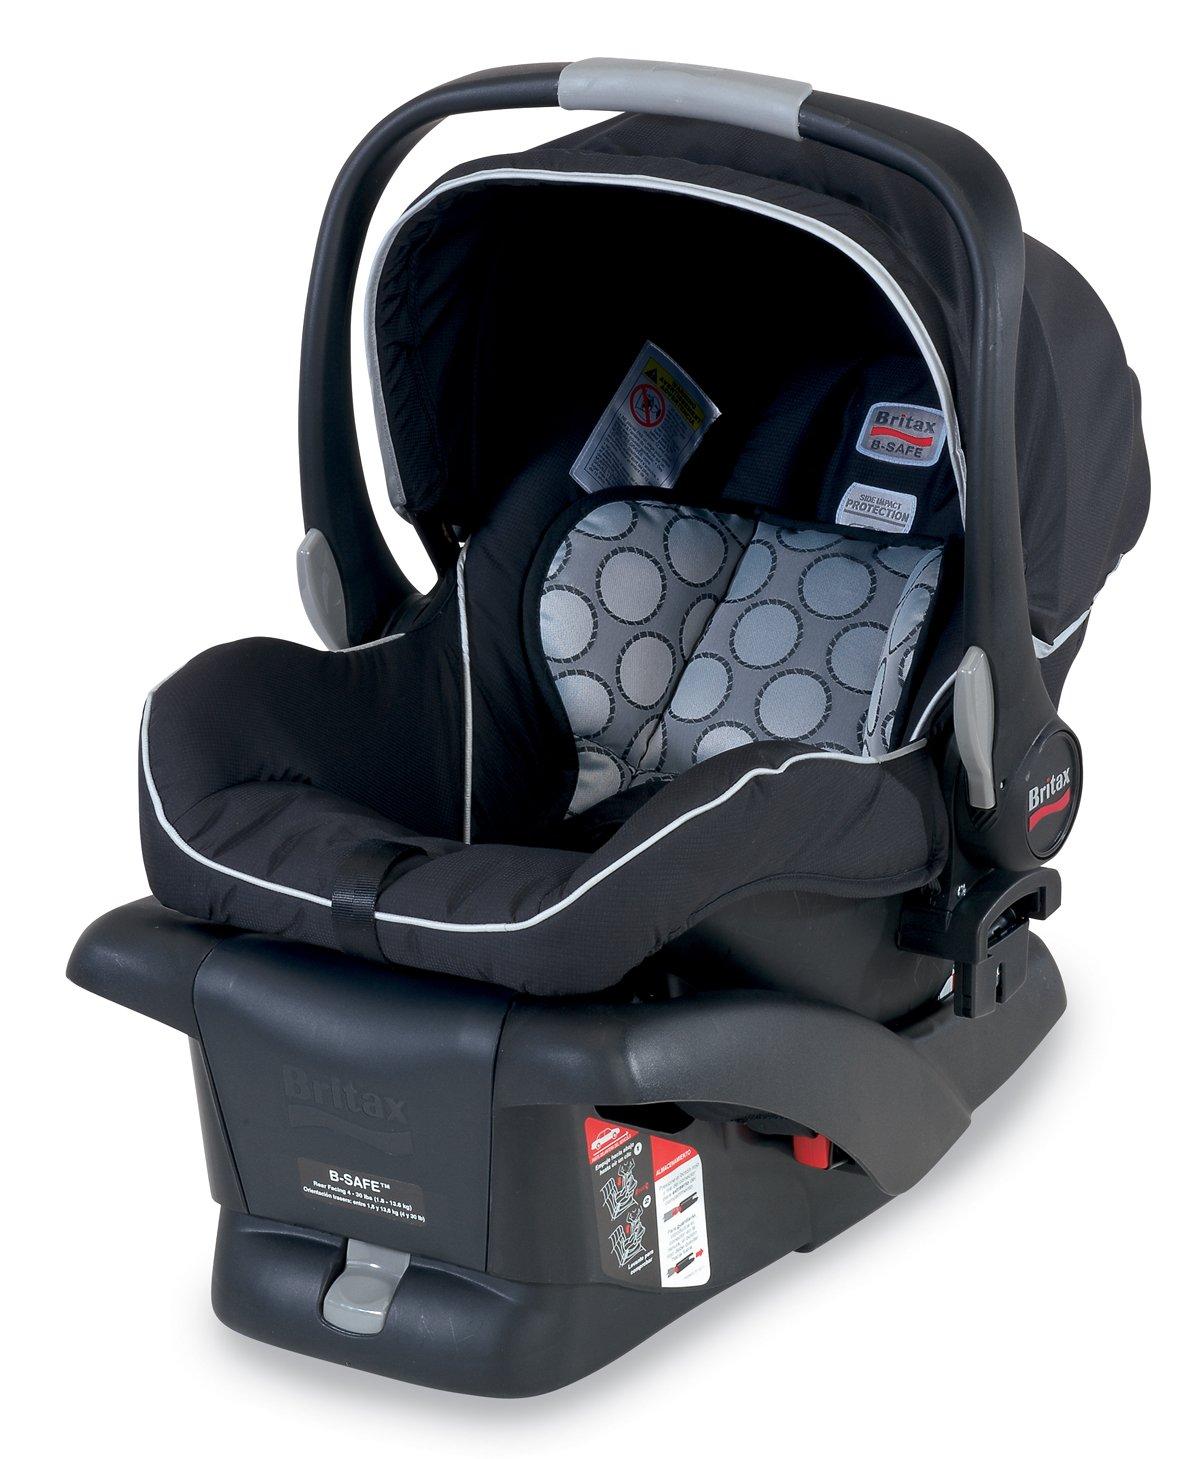 britax infant car seat cover replacement velcromag. Black Bedroom Furniture Sets. Home Design Ideas